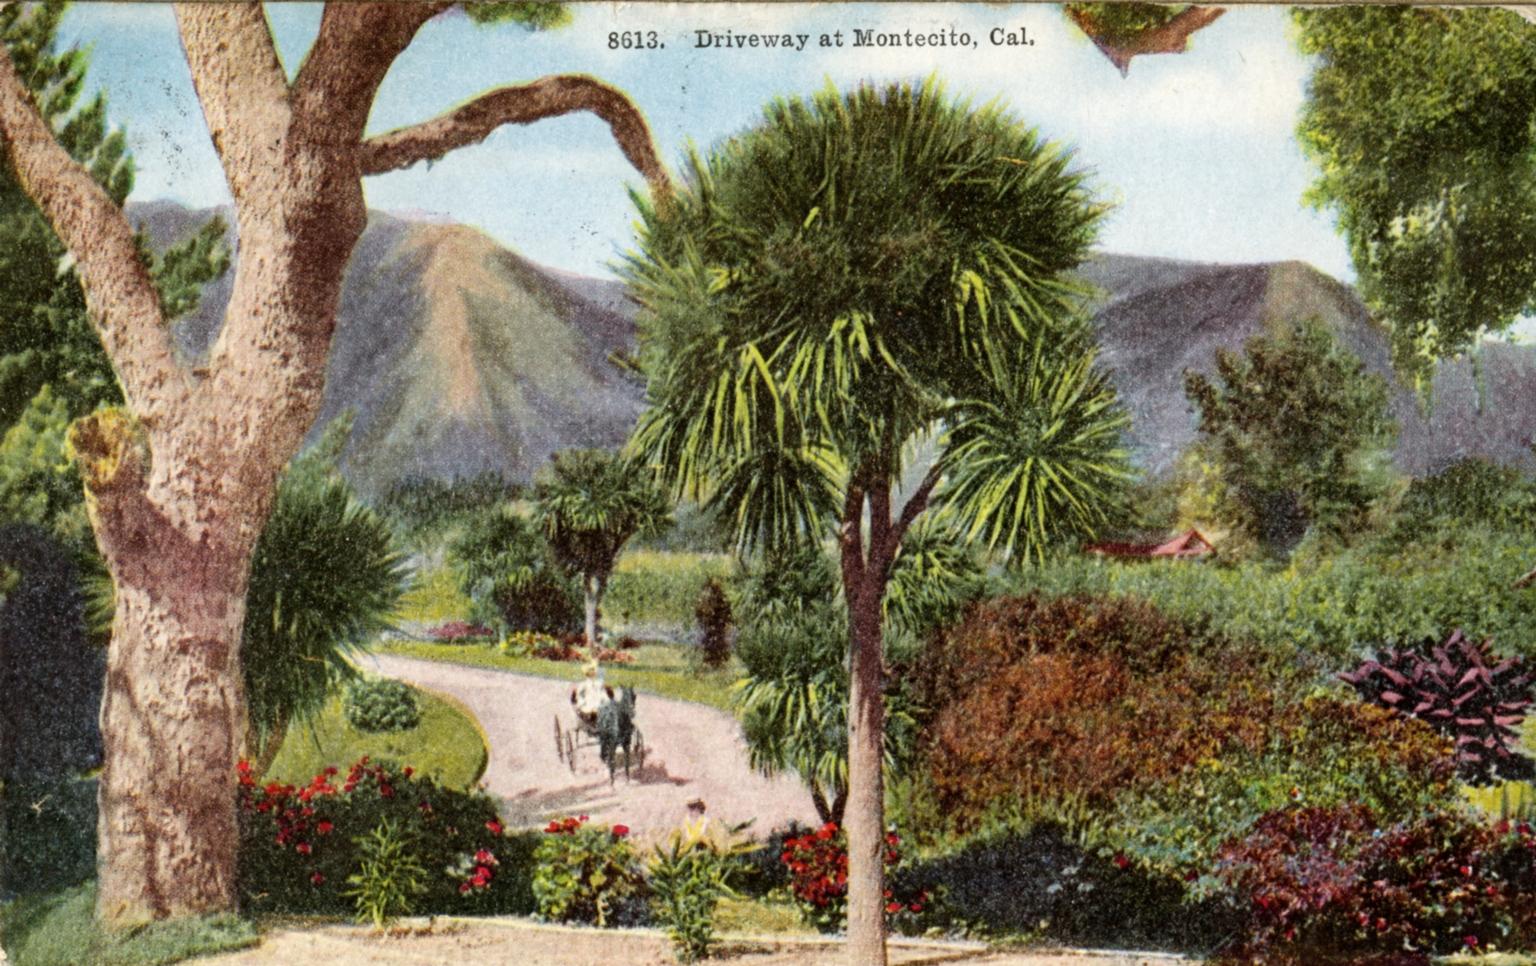 Montecito Driveway